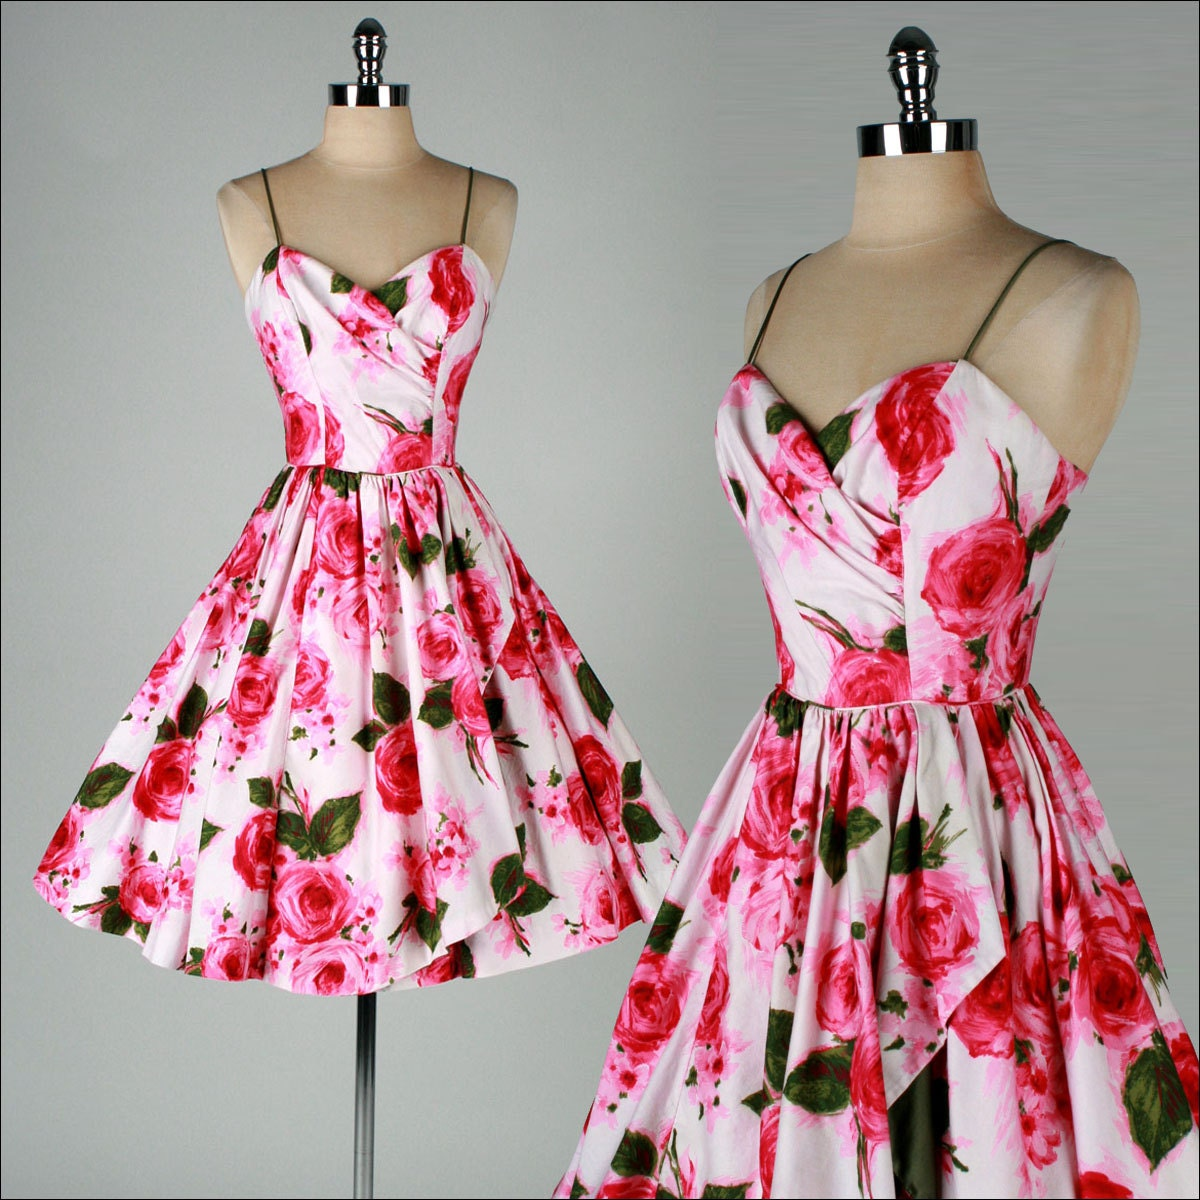 vintage 1950s dress TABAK CA pink floral print cotton